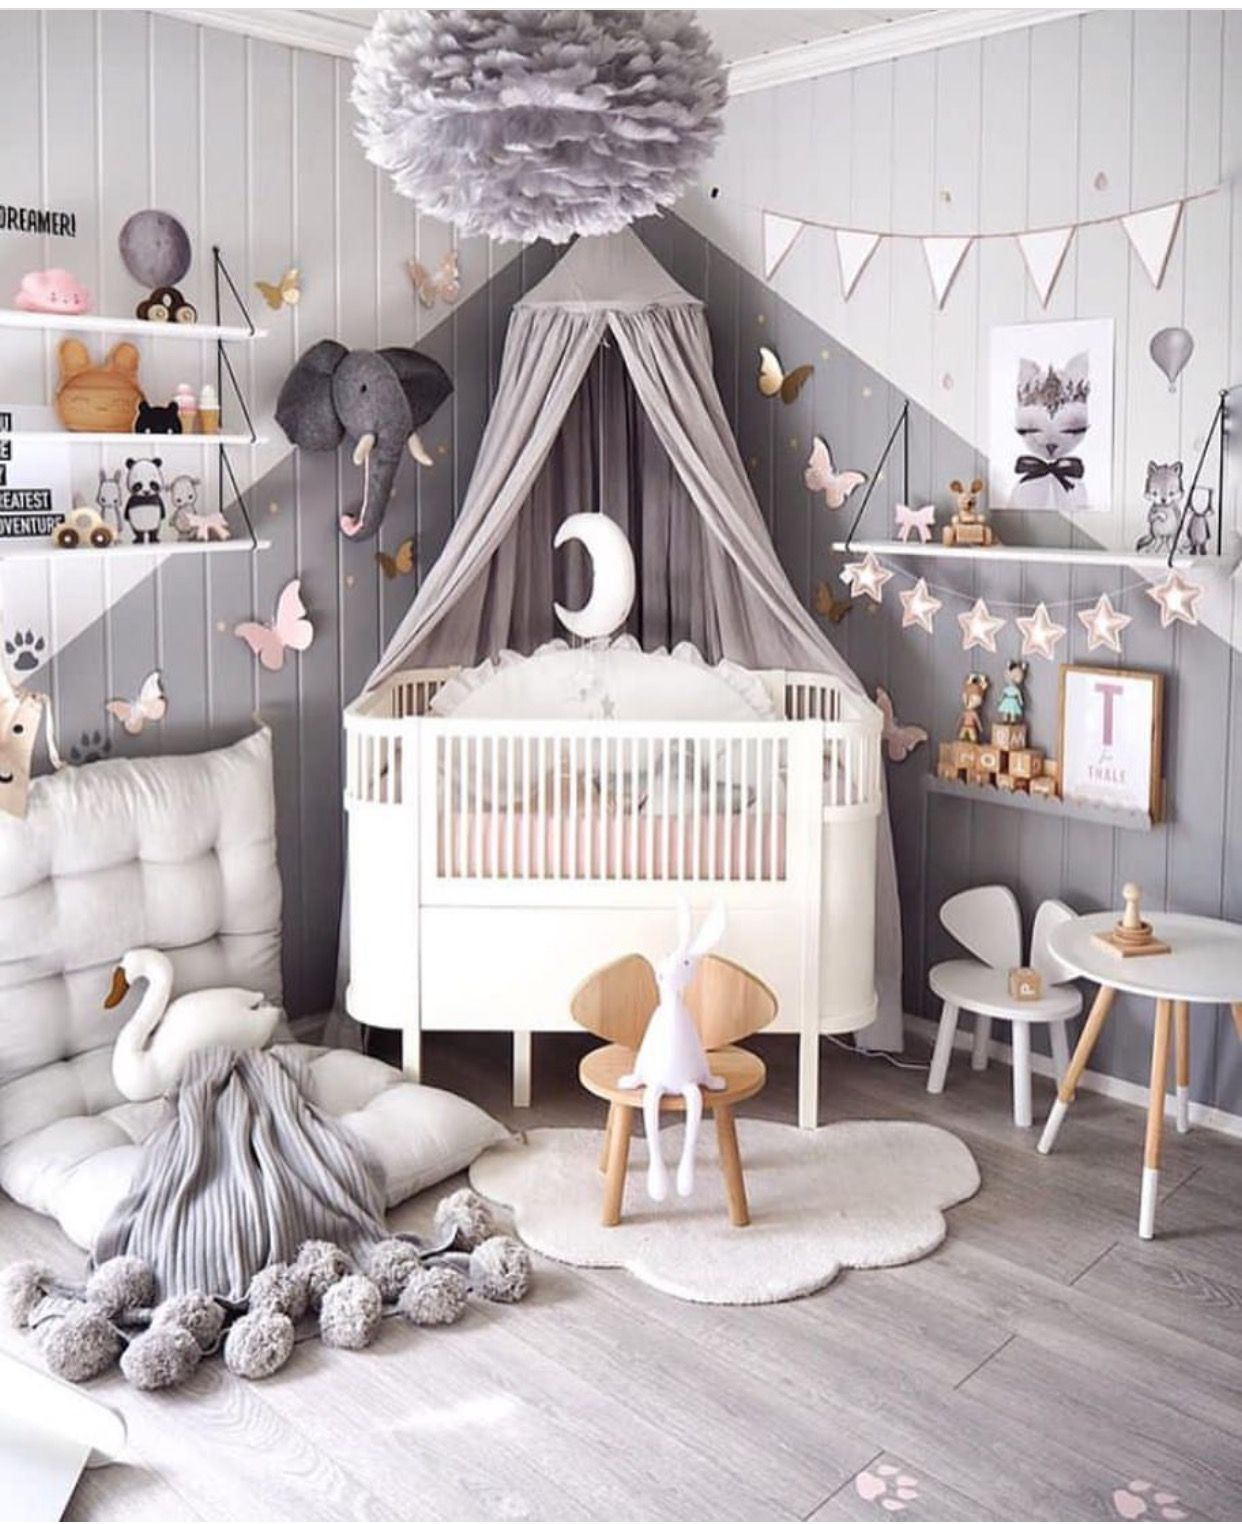 Pin by Cynthia on Baby | Pinterest | Chambre bébé, Bebe and Chambre ...